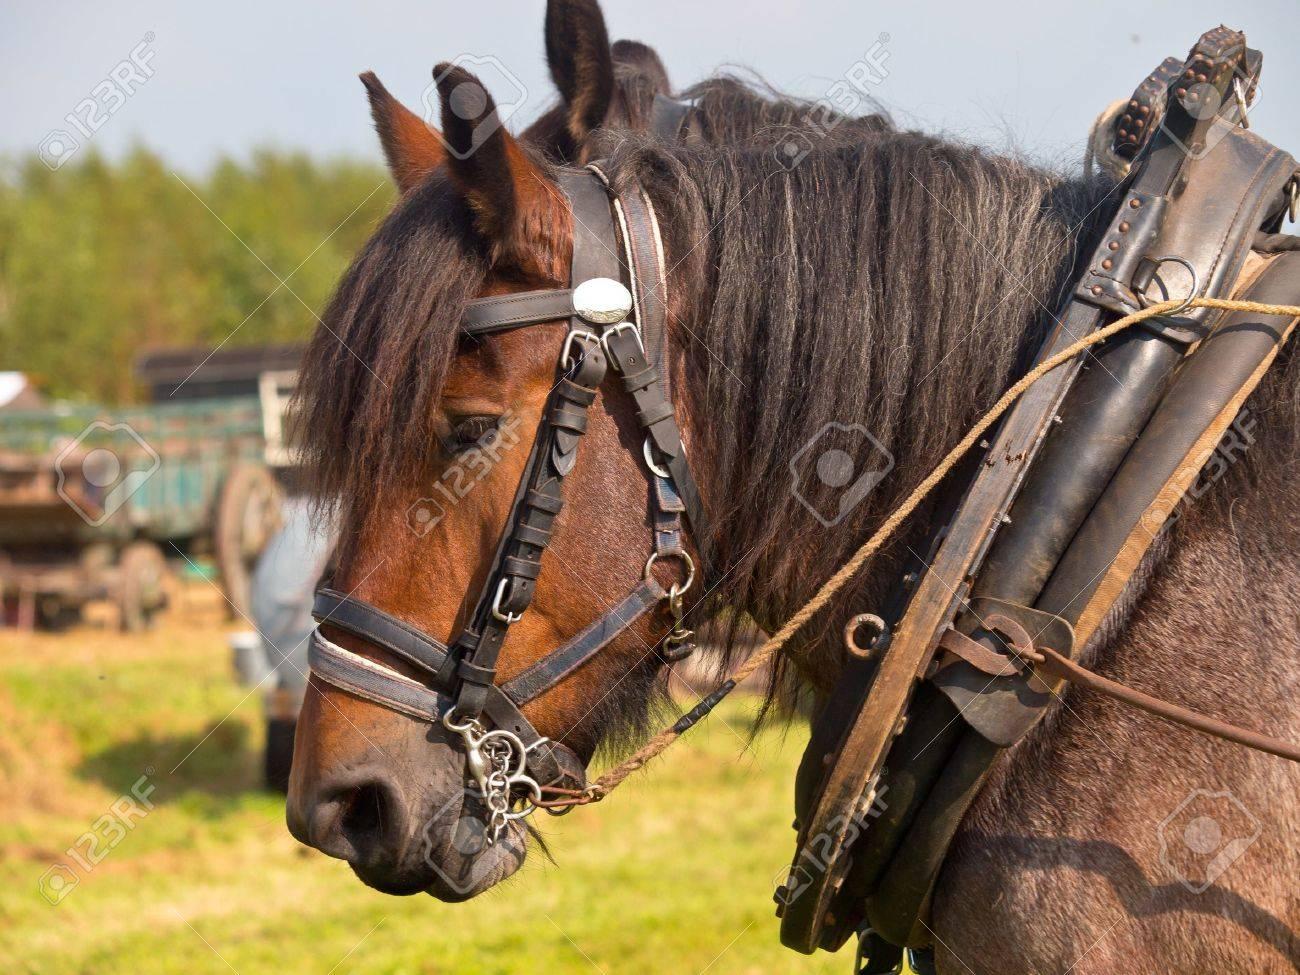 Couple of vintage pulling horses Stock Photo - 11334468